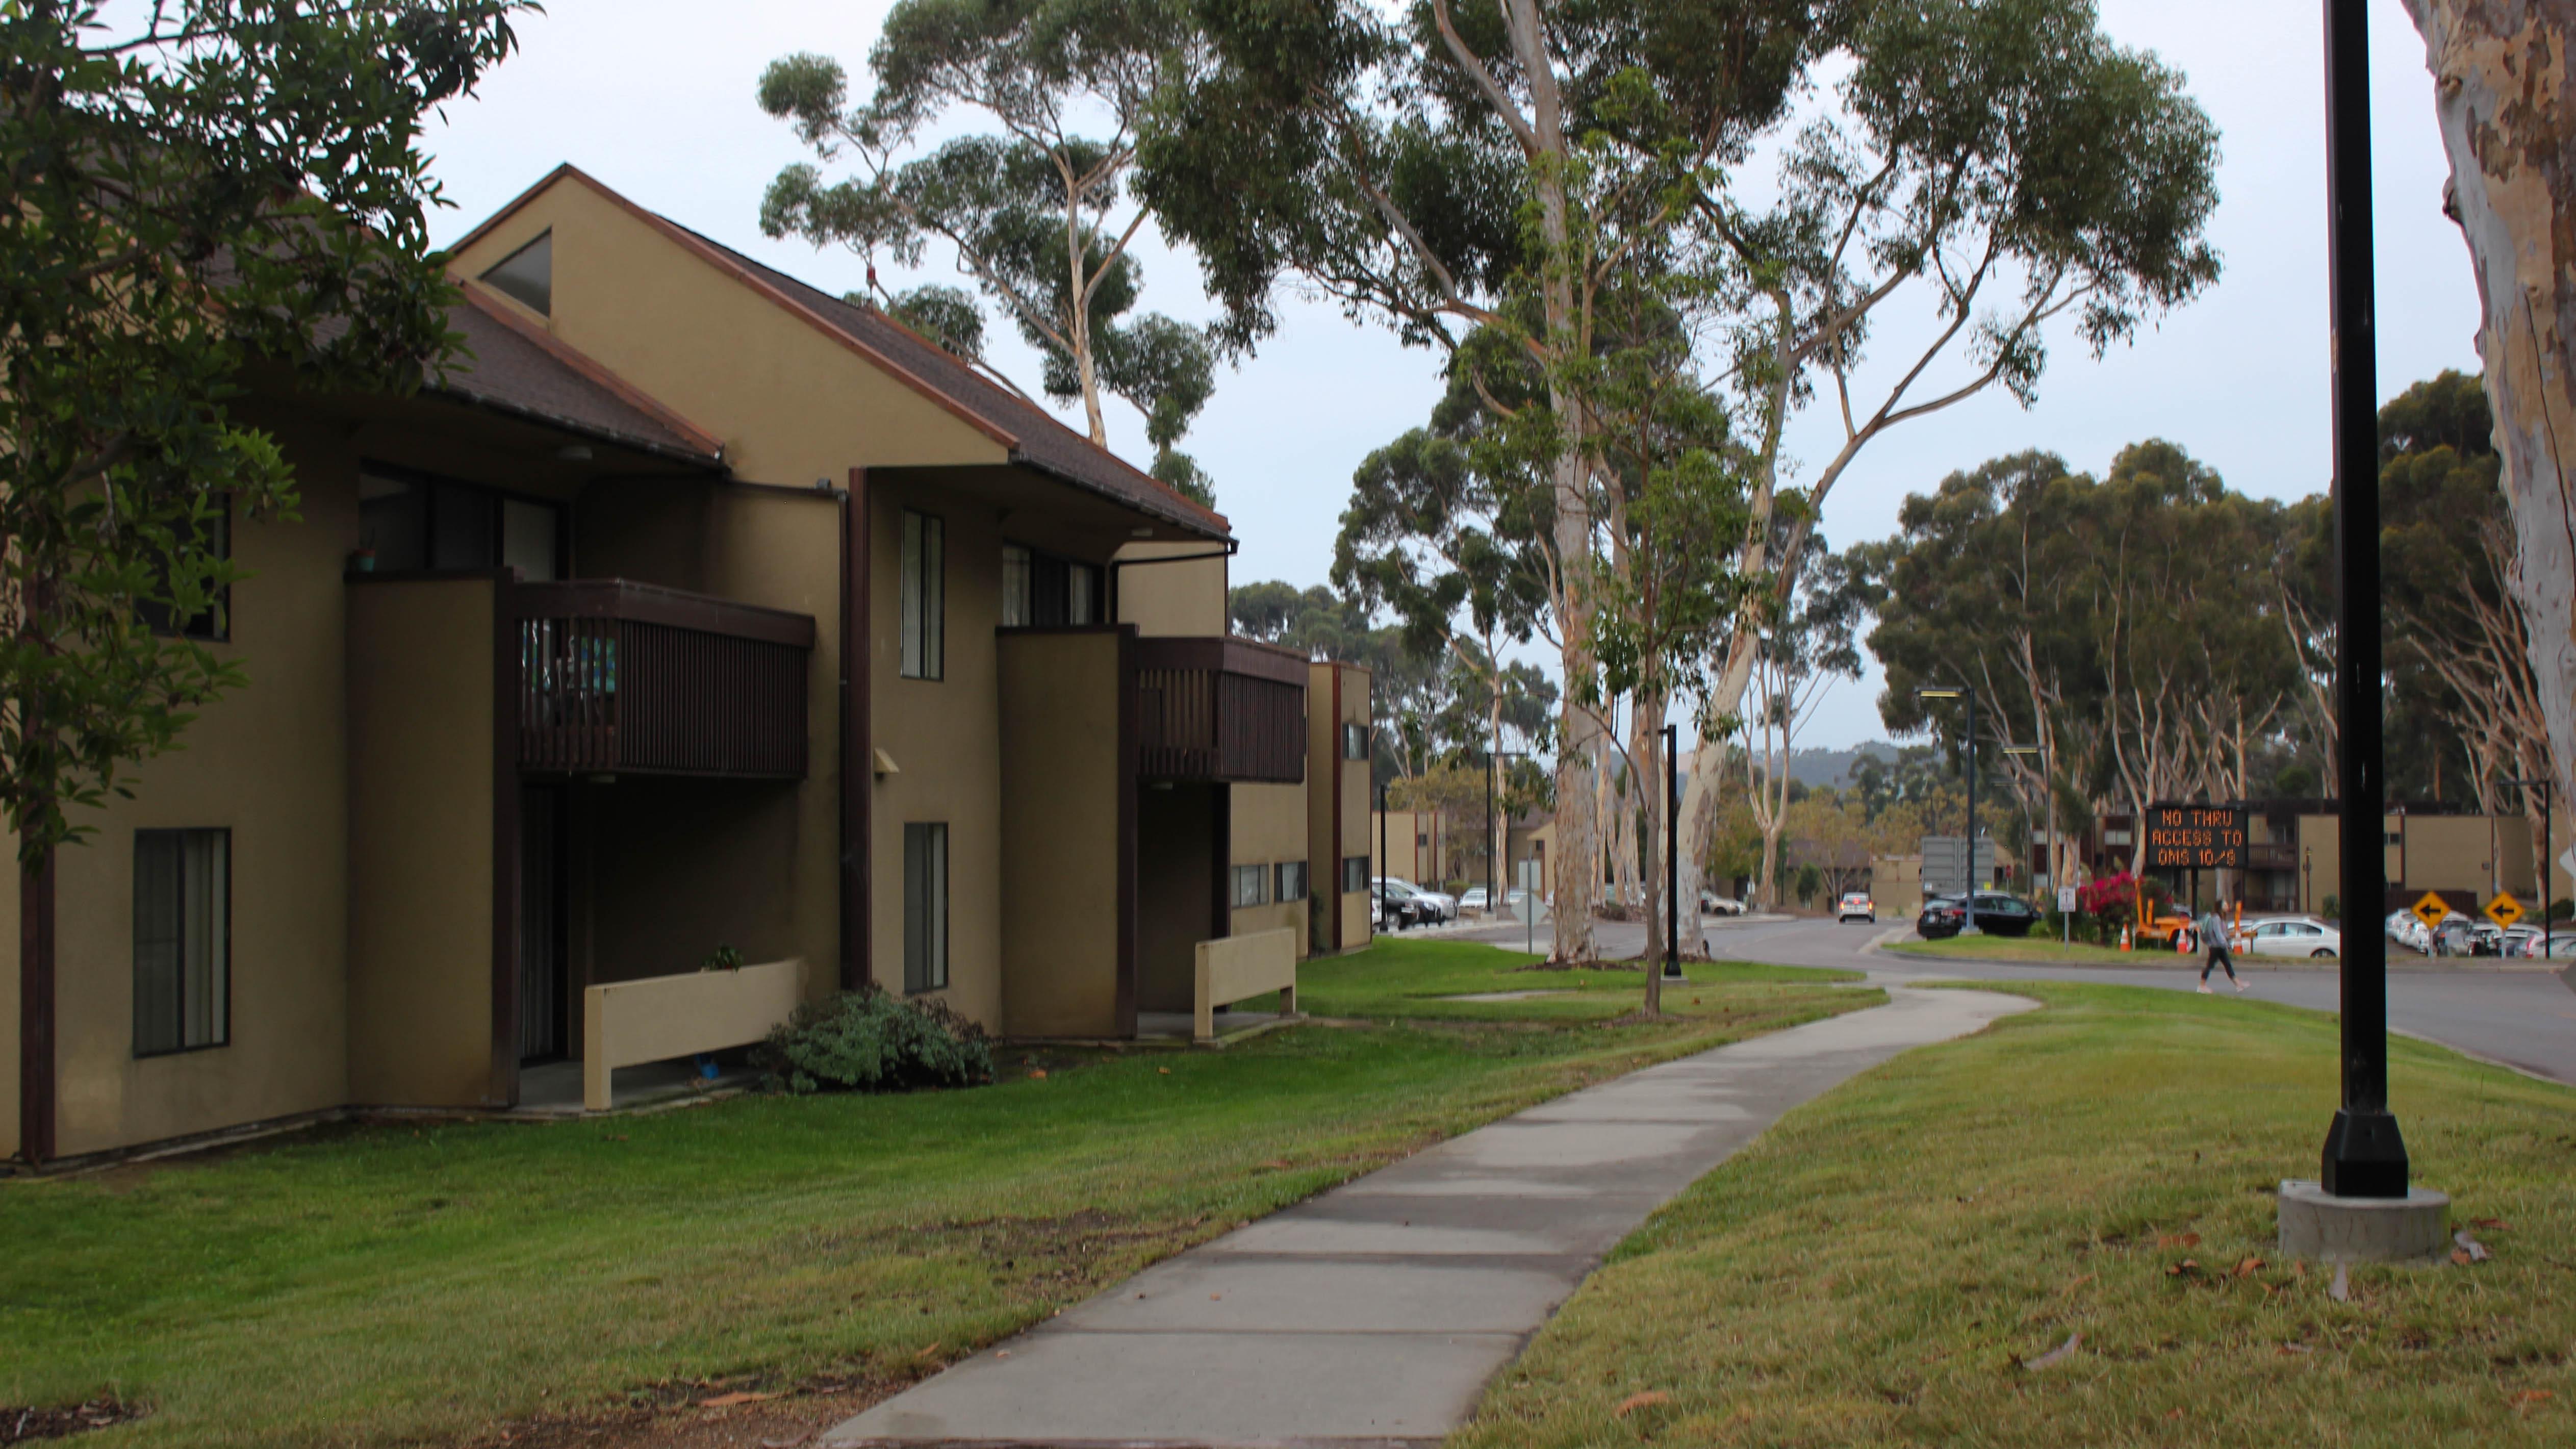 Mesa Housing. Connor Gorry / The Triton.